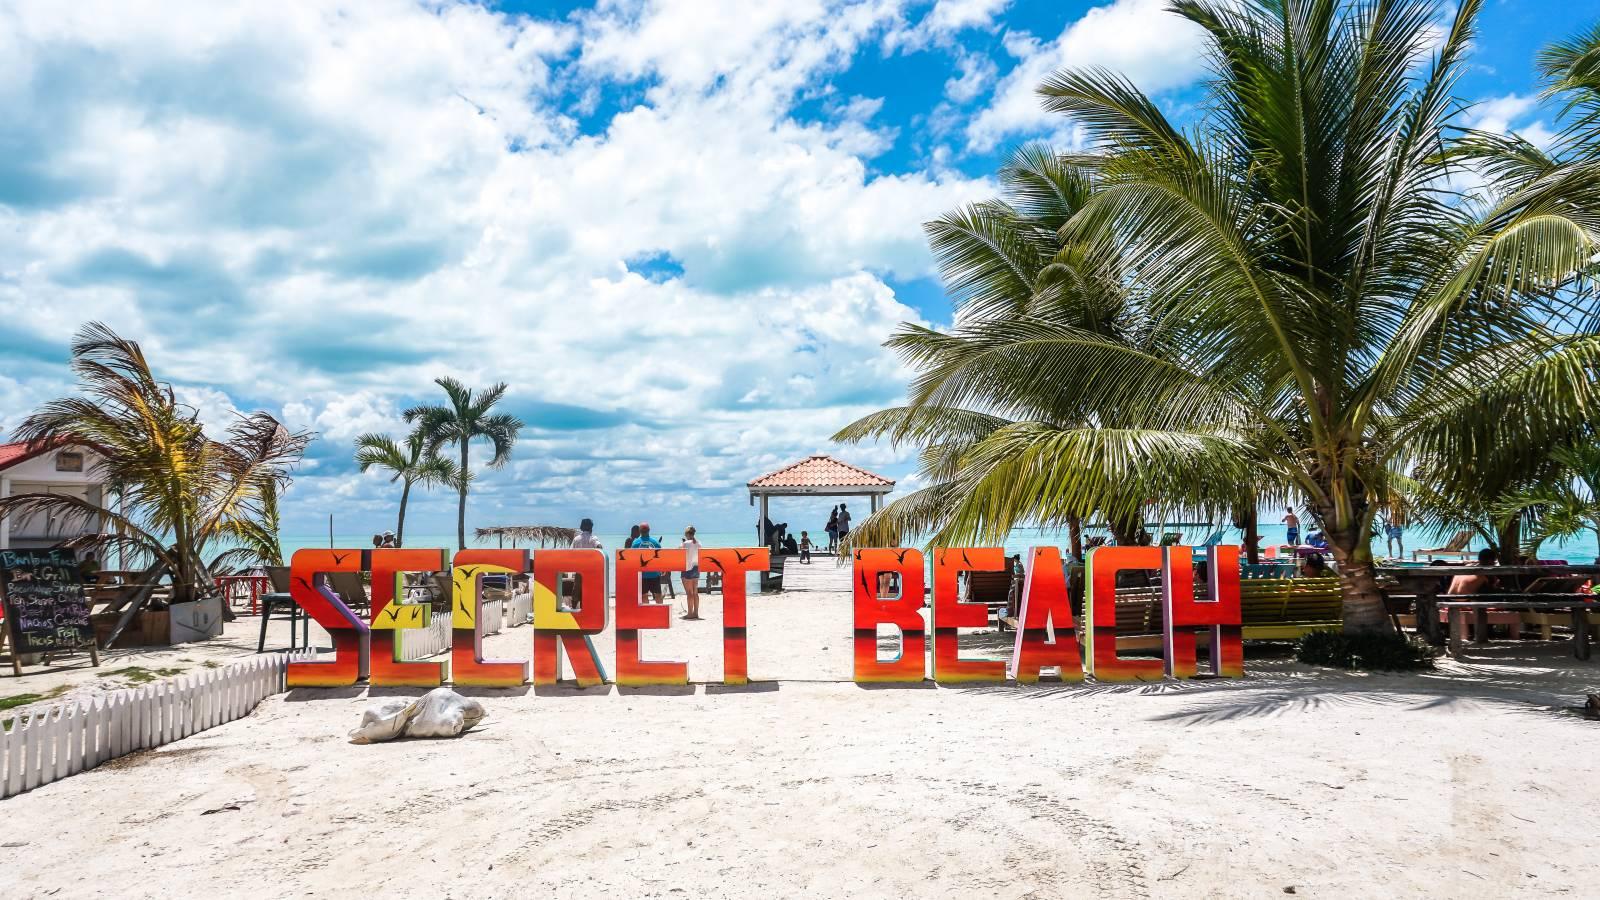 Secret Beach in Ambergris Caye, Belize